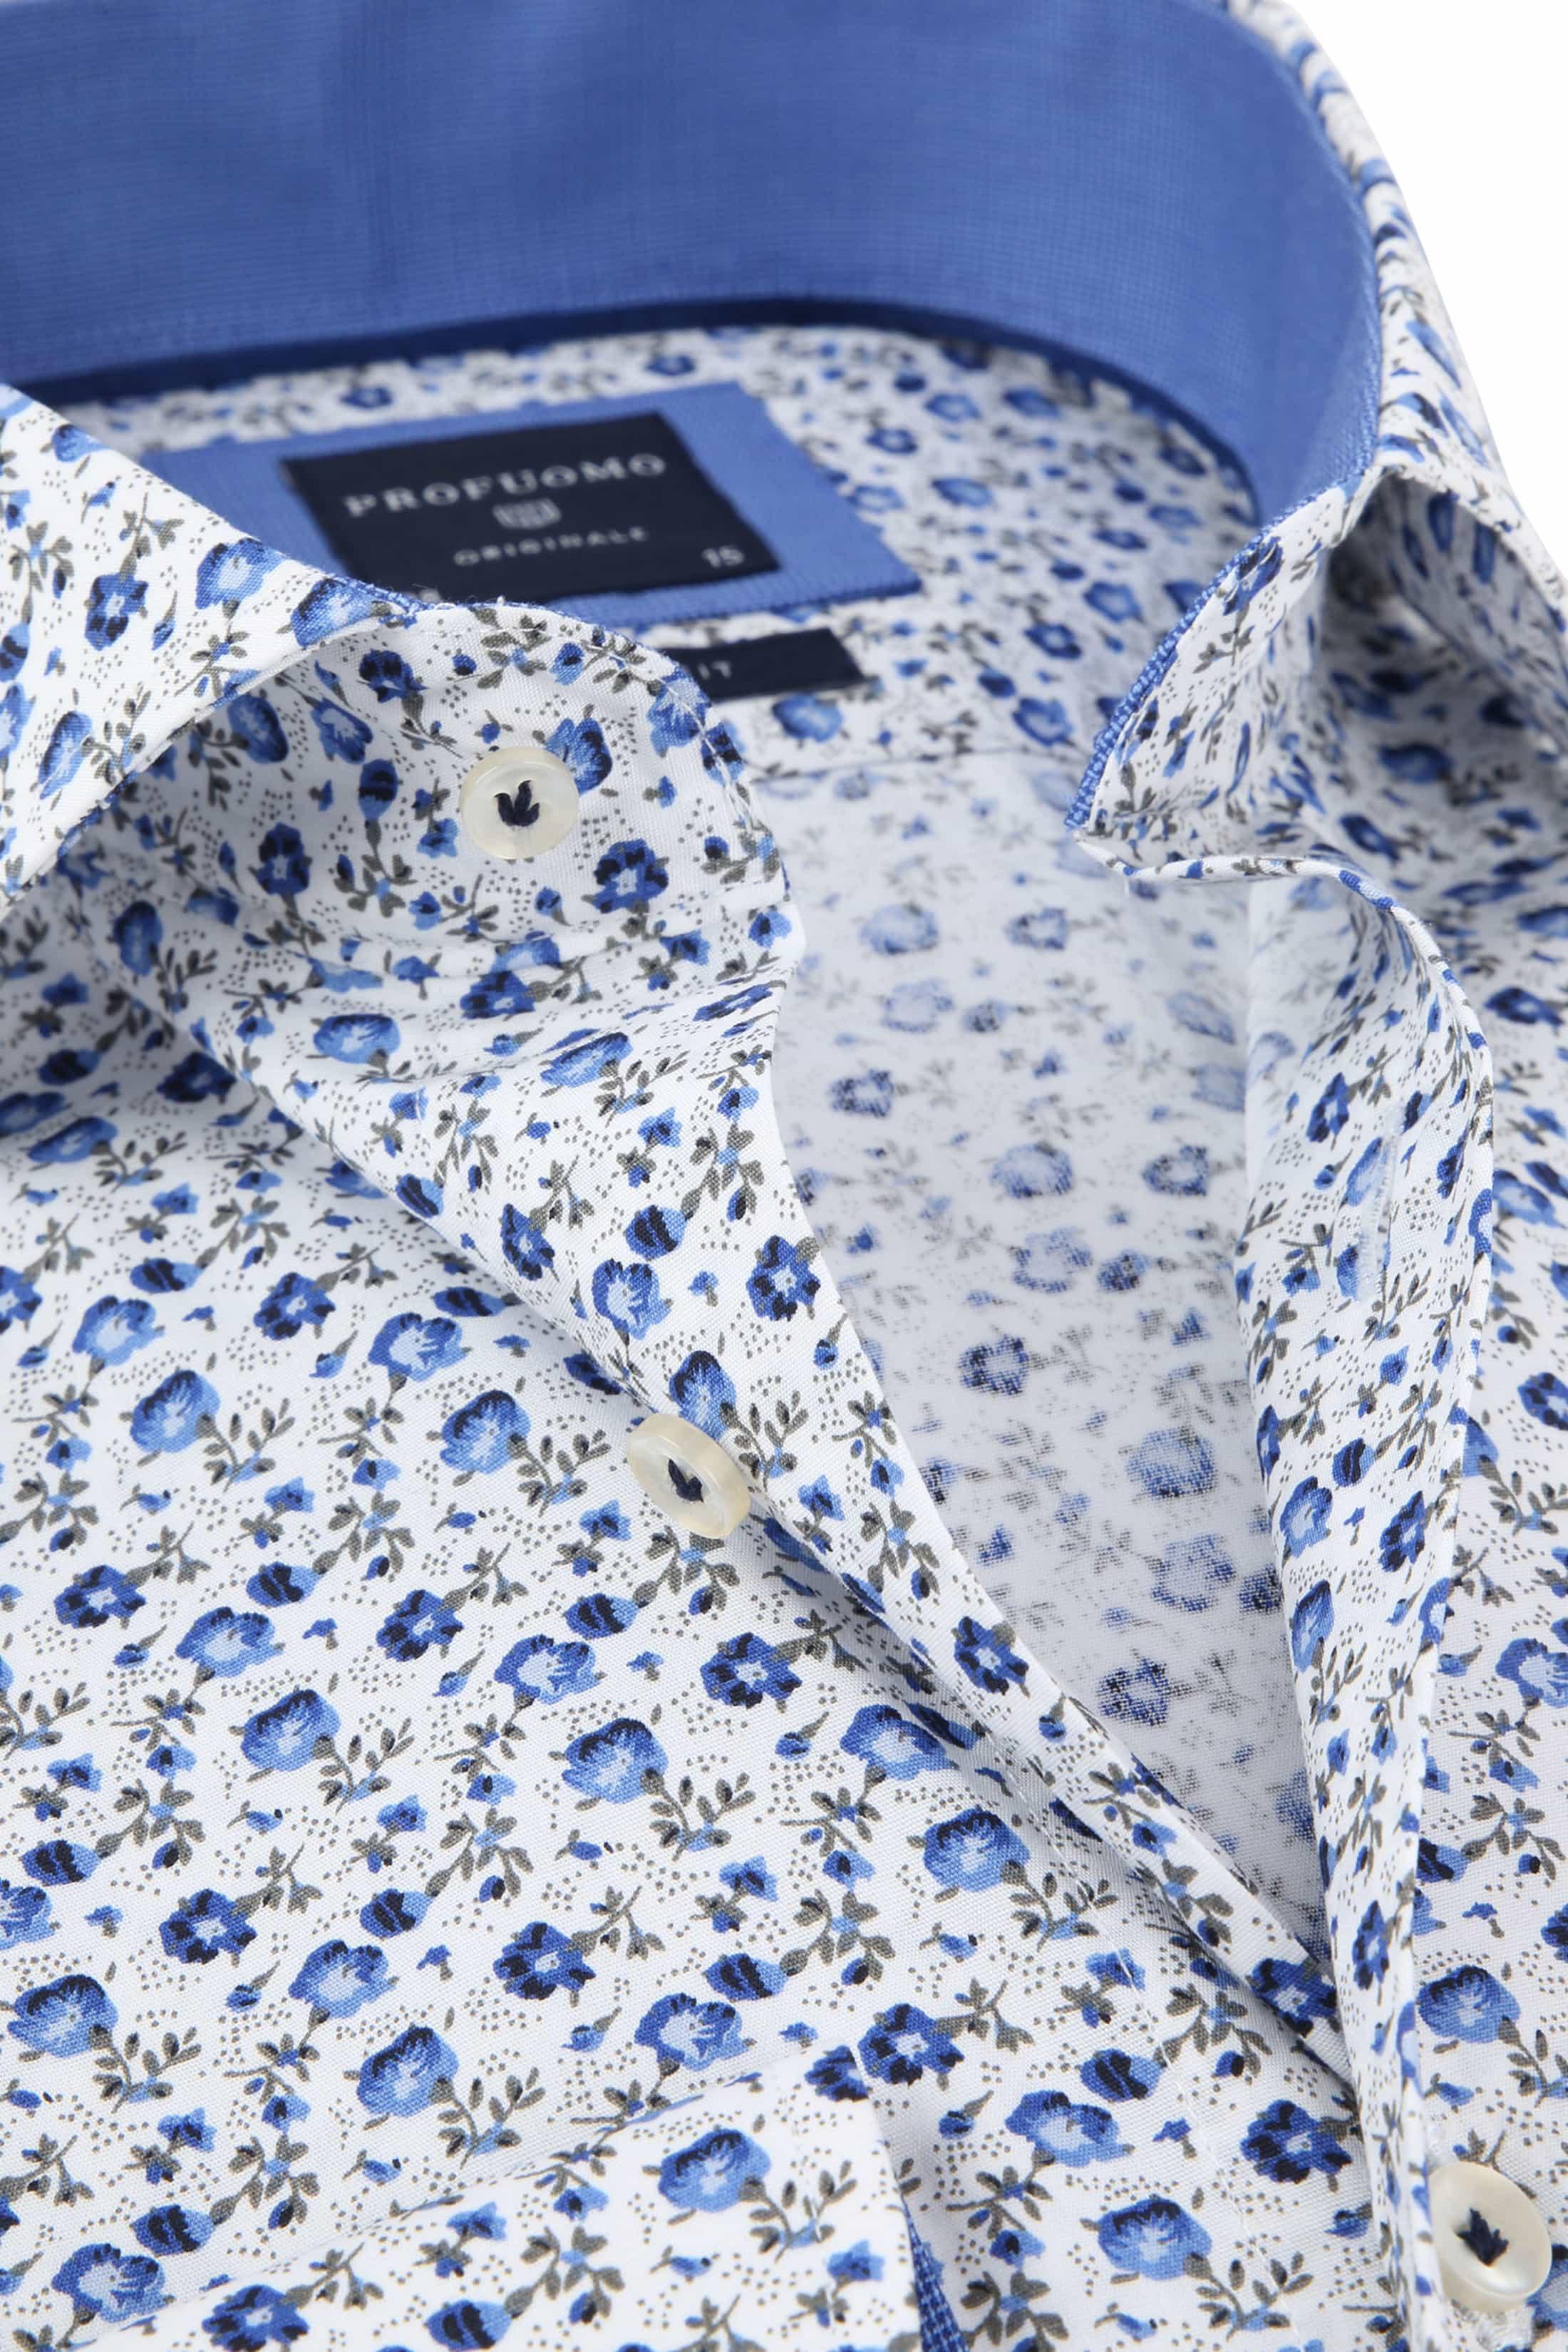 Profuomo Overhemd CAW Blumen foto 1